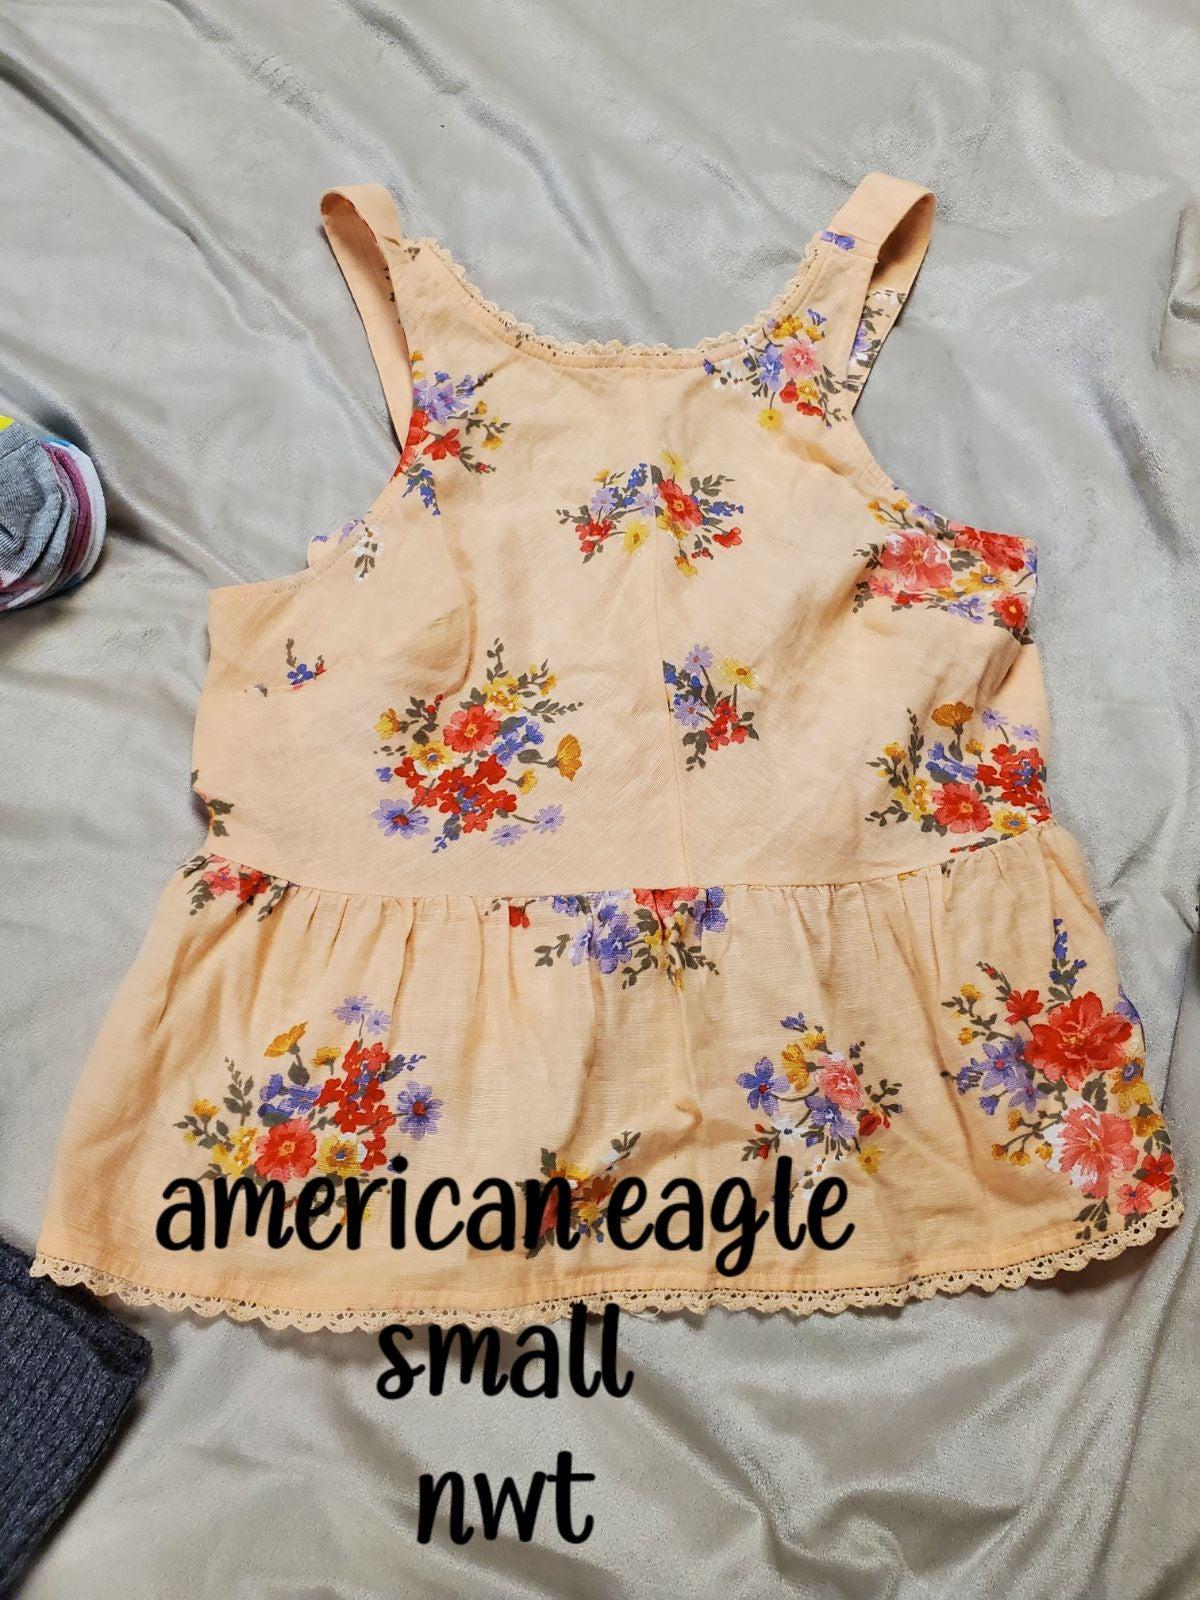 American eagle tank size small